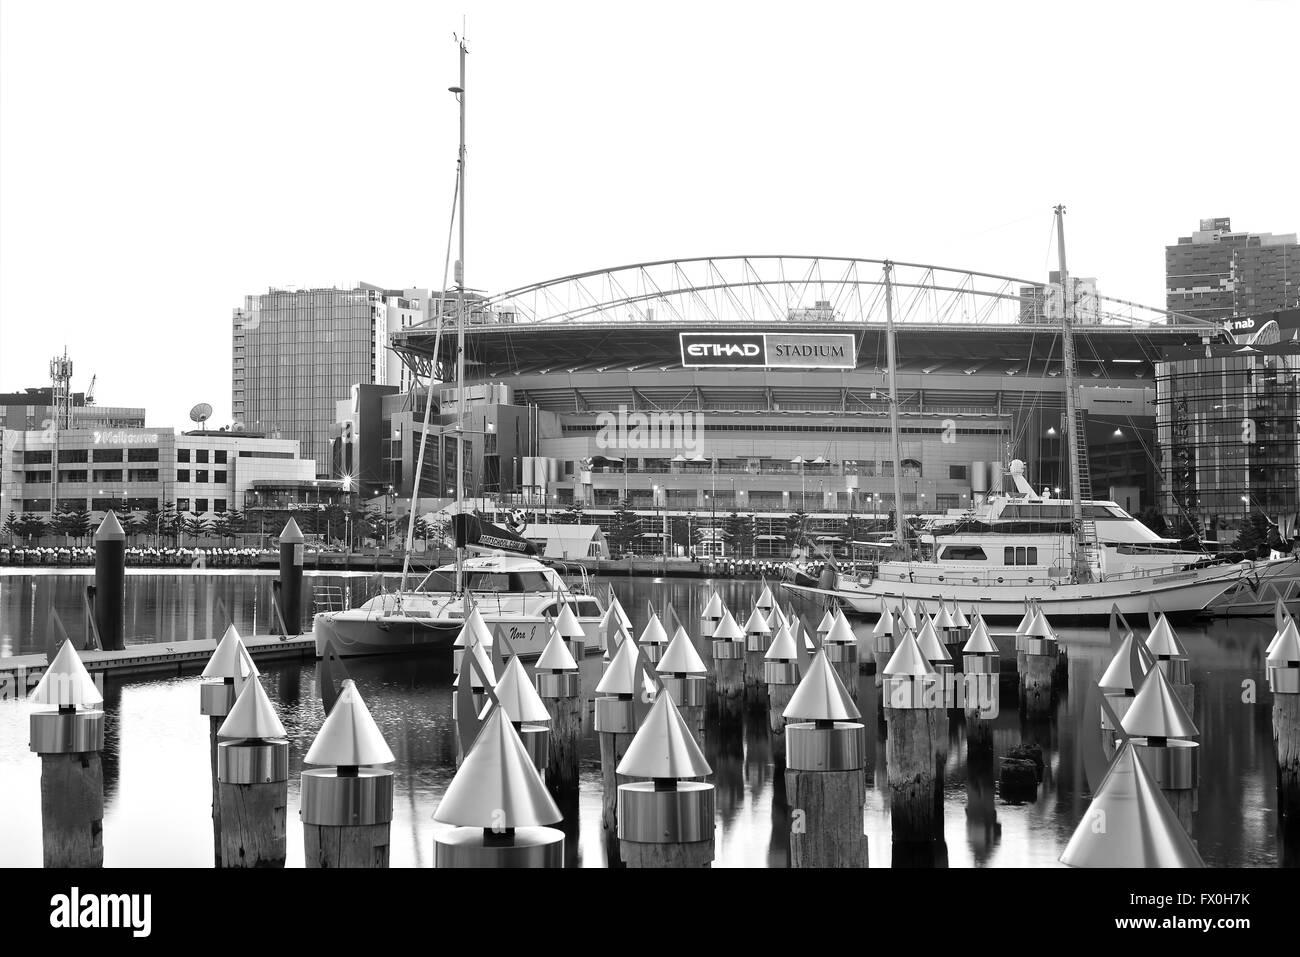 A black and white photo of Etihad stadium in Docklands, Melbourne, Australia. - Stock Image